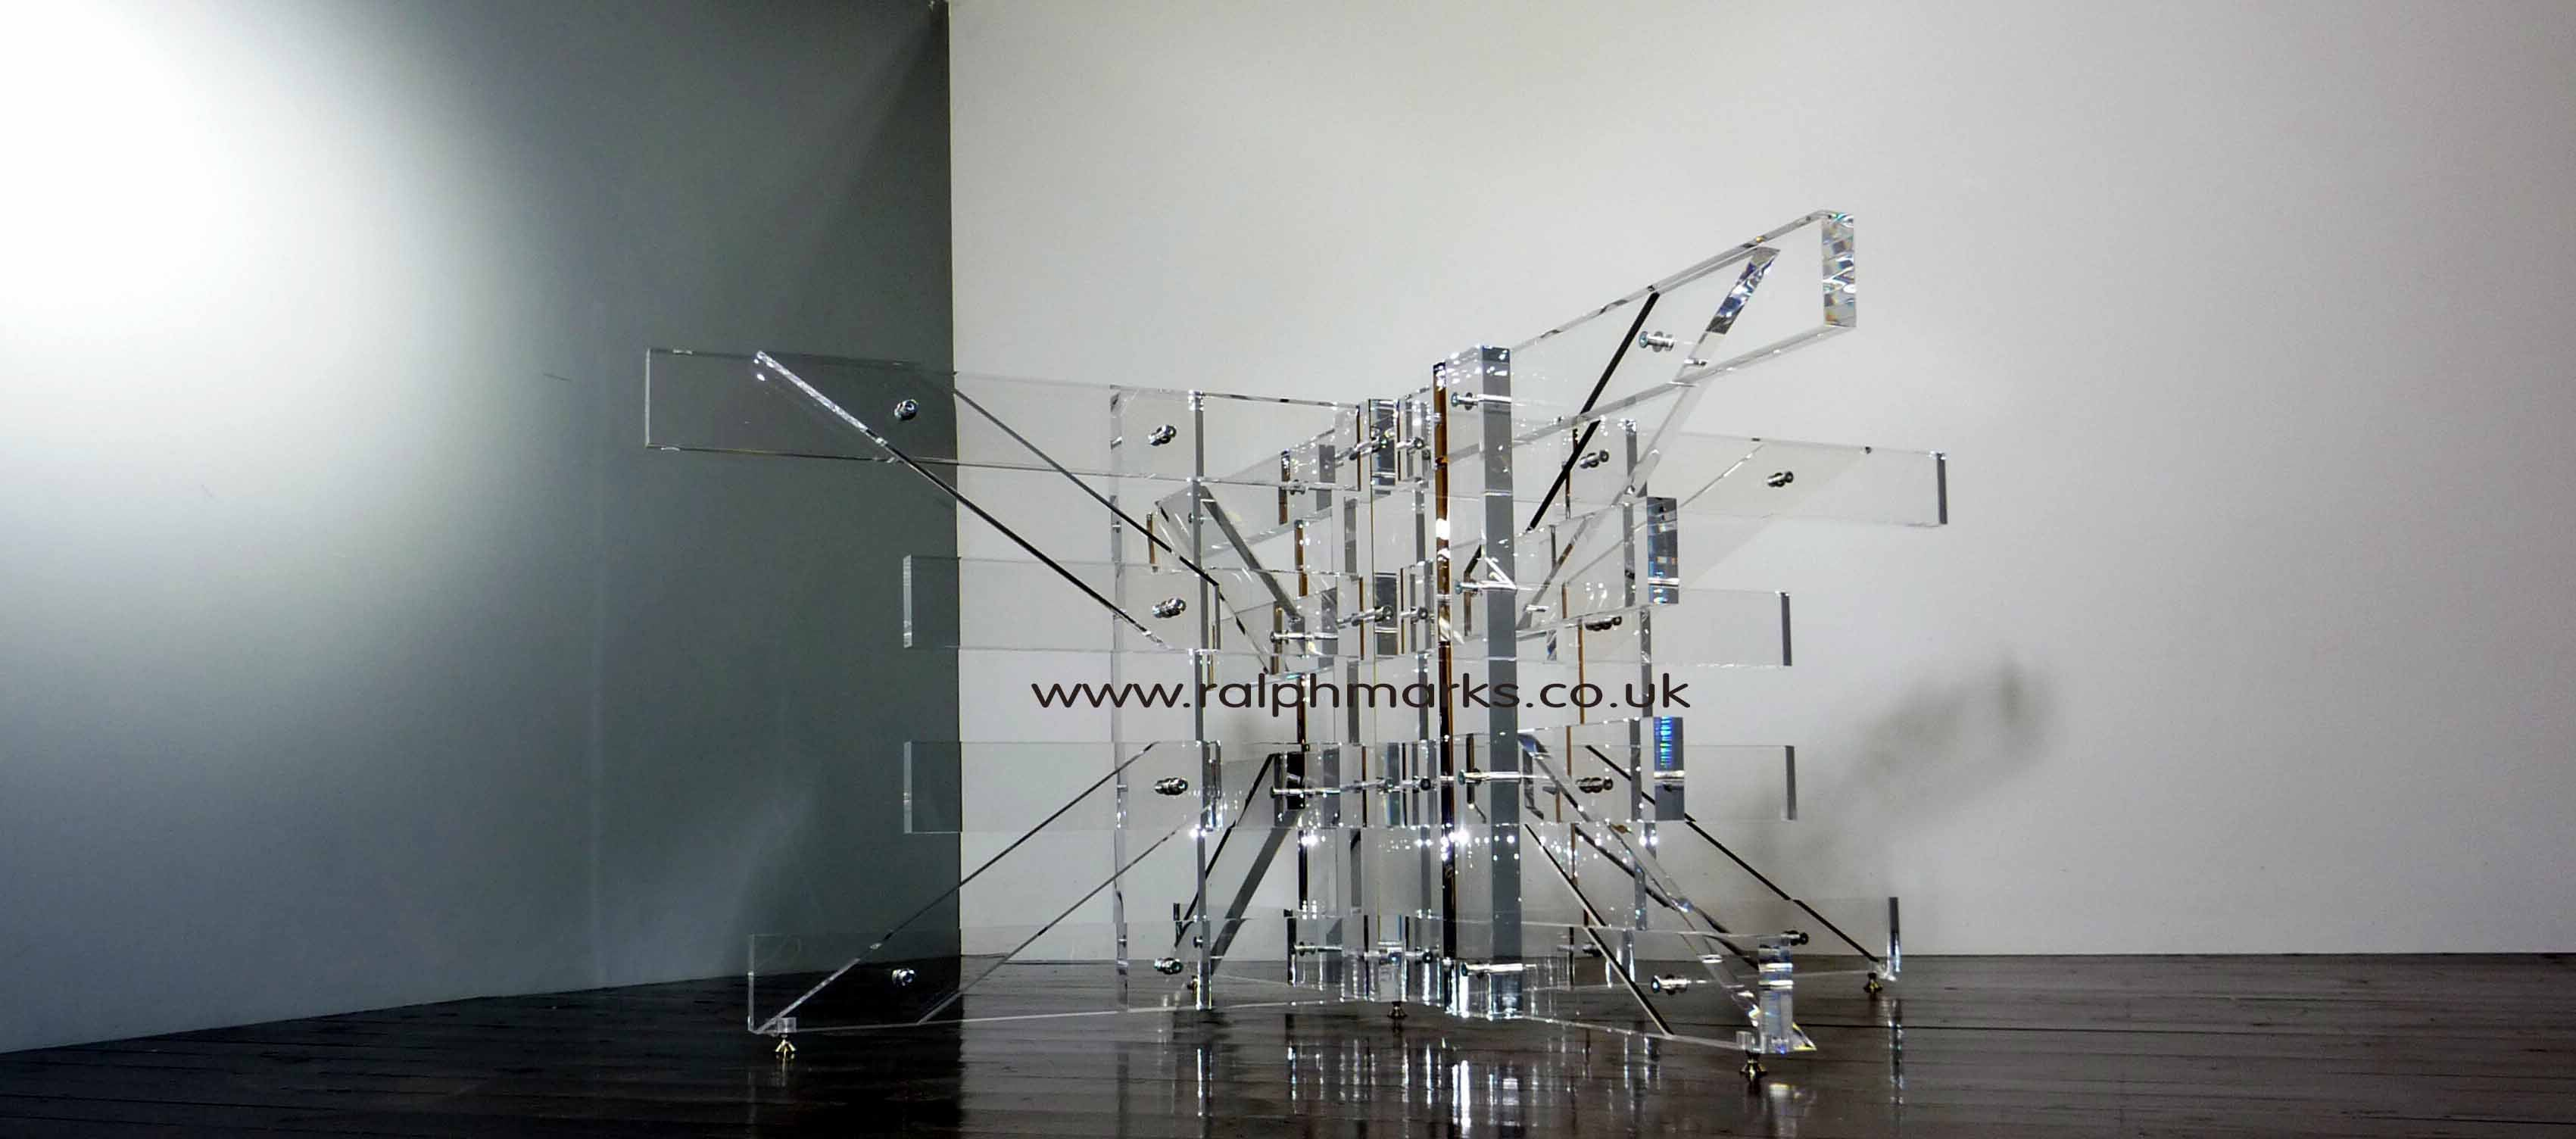 Ralph Marks Perspex Acrylic Furniture UK Acrylic  : AcrylicDiningTable 3 WEBcopy from www.ralphmarks.com size 1200 x 531 jpeg 78kB